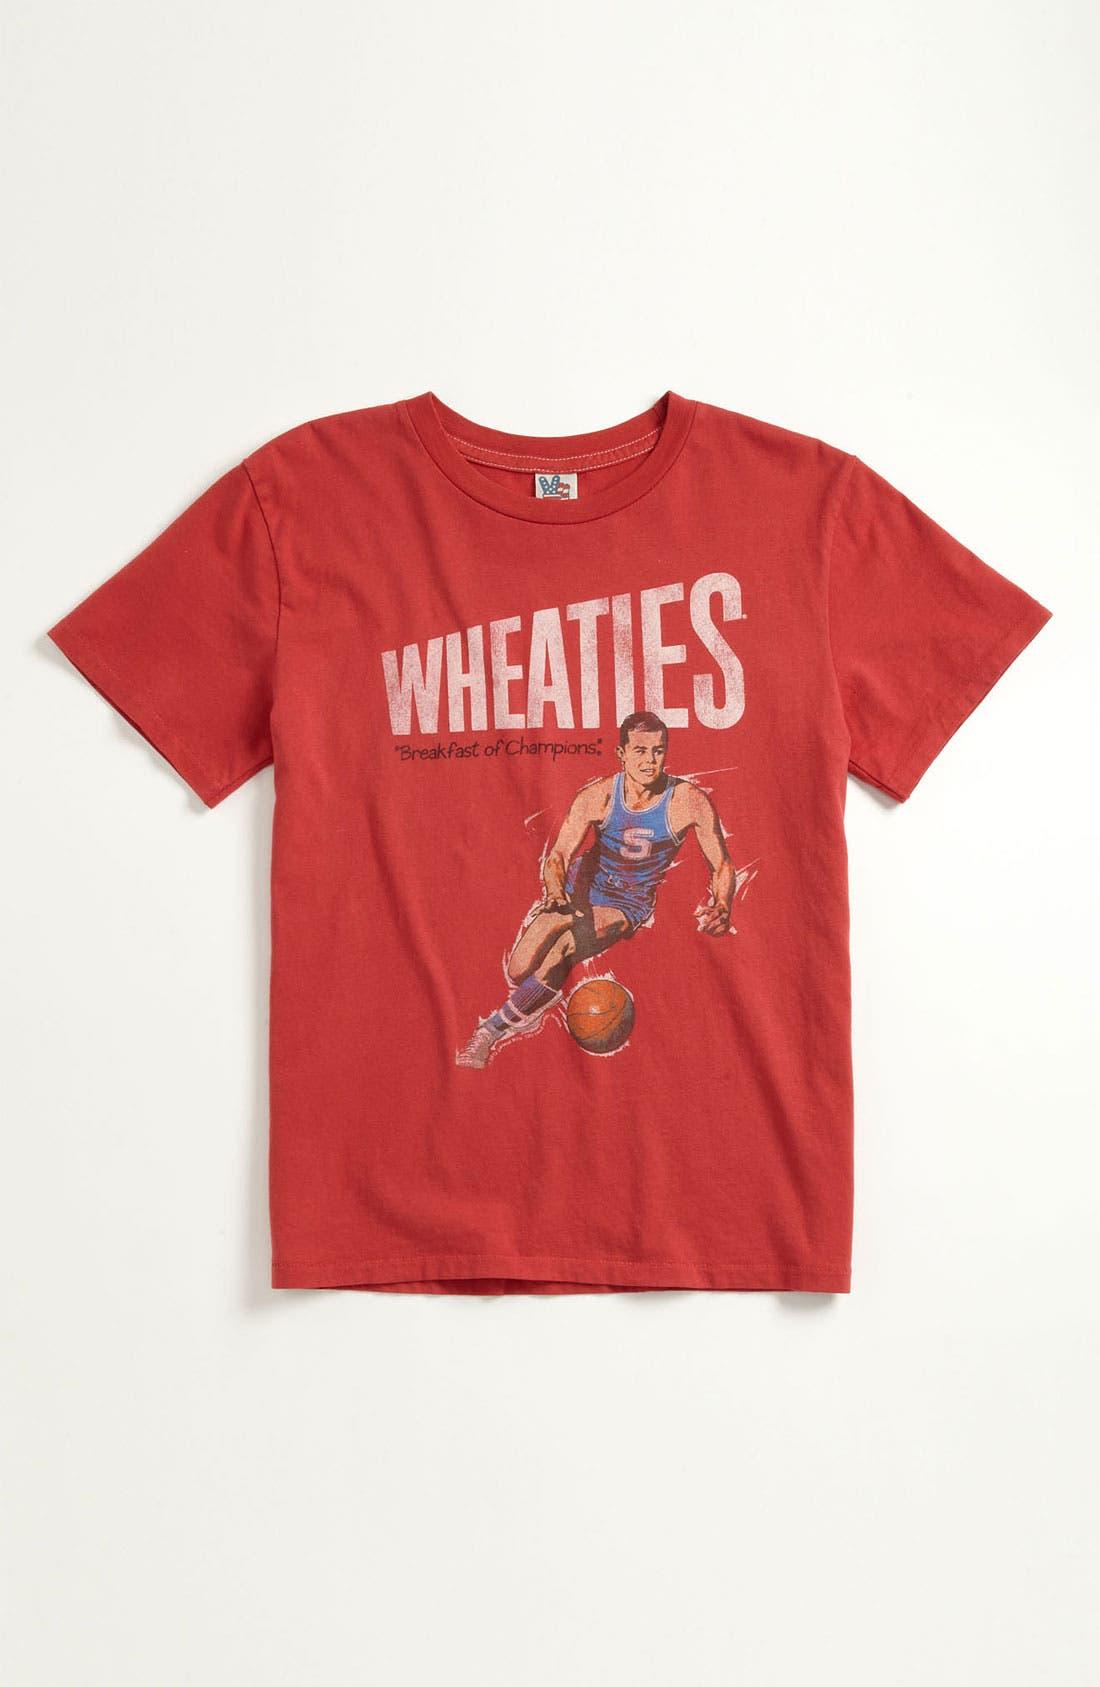 Alternate Image 1 Selected - Junk Food 'Wheaties' T-Shirt (Little Boys & Big Boys)